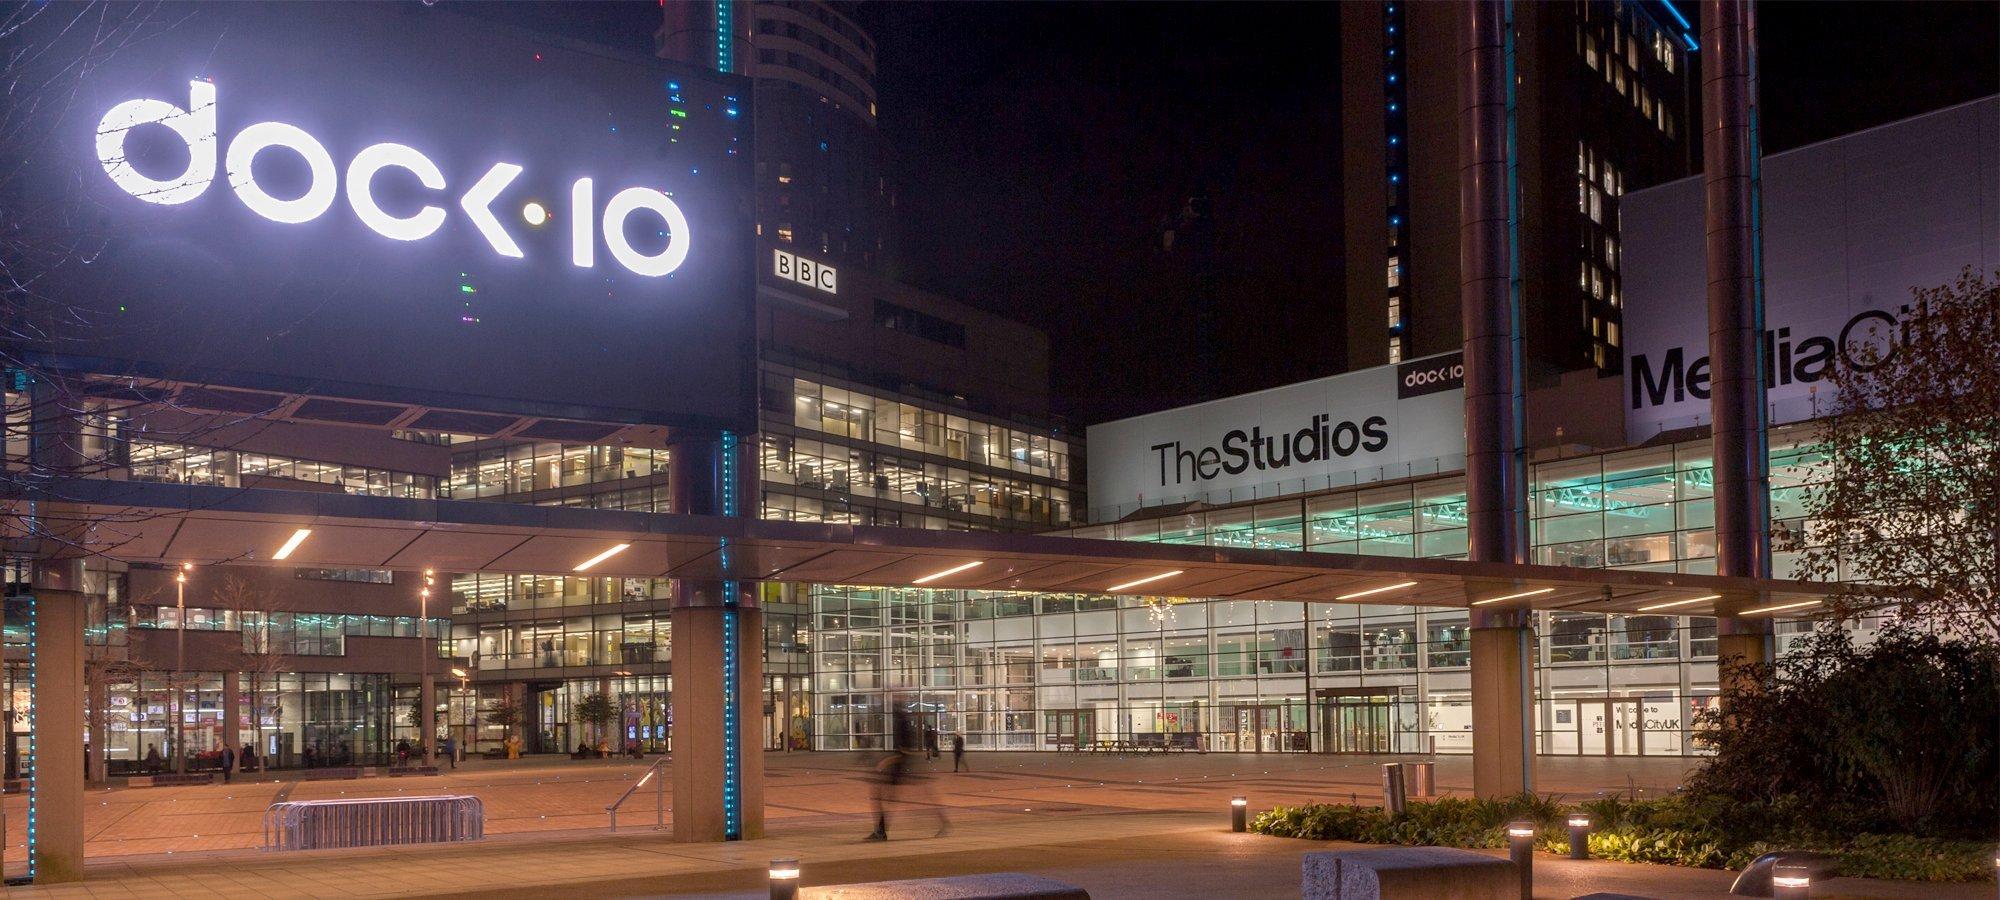 dock10 studios at MediaCityUK, Salford